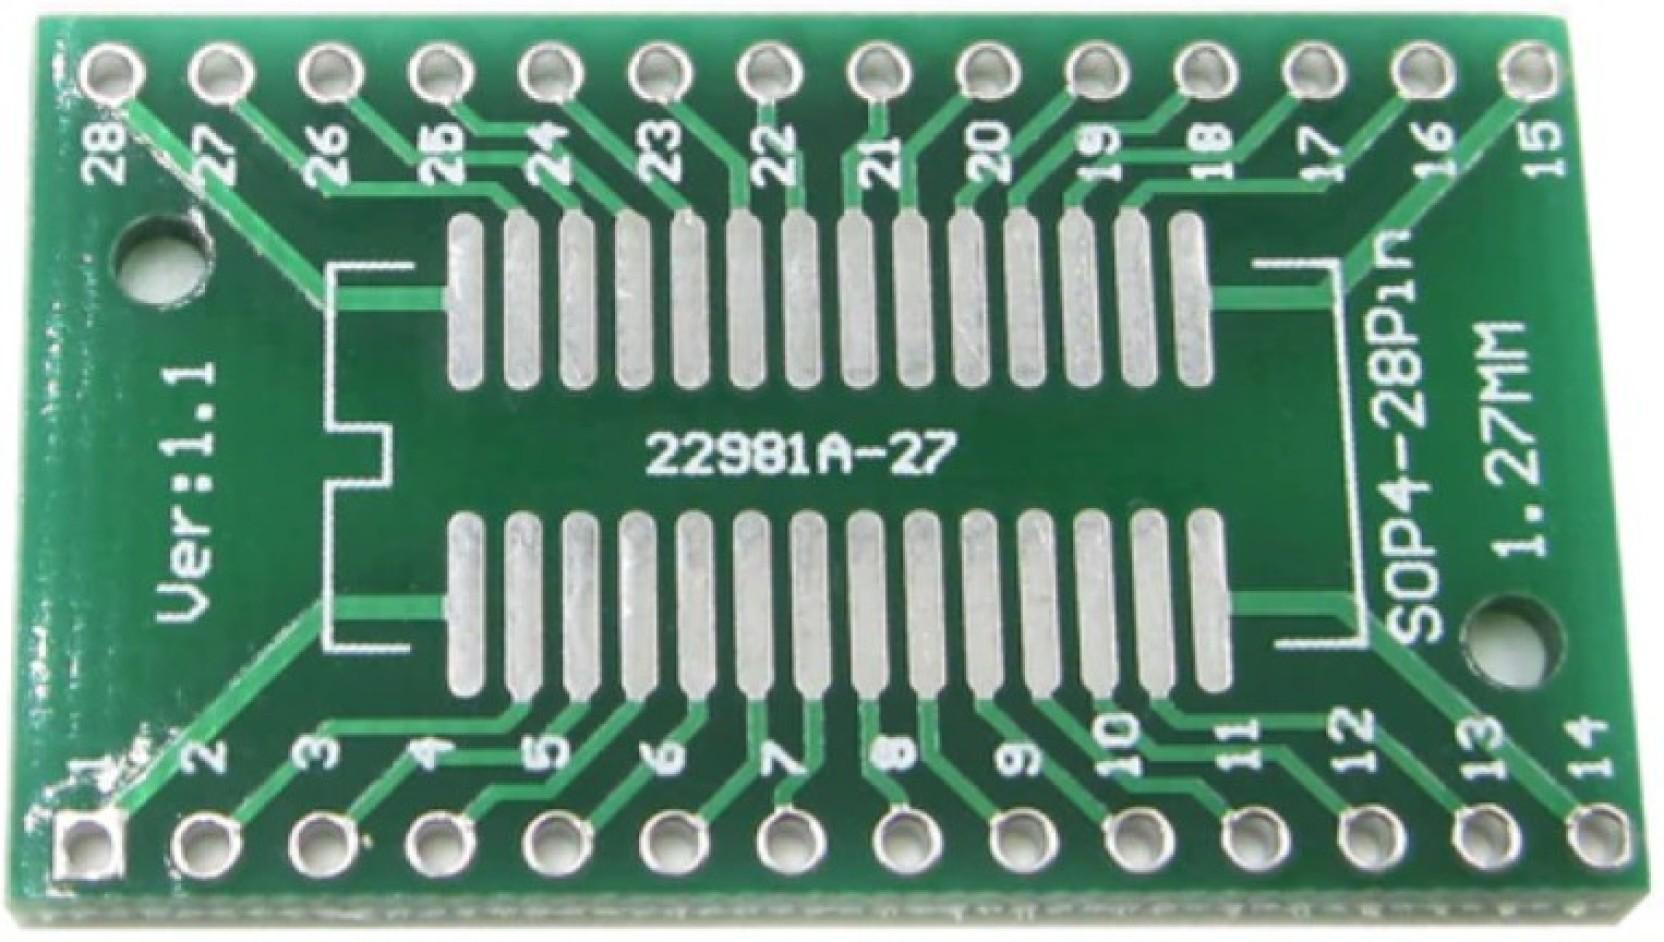 Kitsguru Tssop28 Ssop28 Adapter Smd Pcb Convert To Dip 28 For Ad9851 Circuit Board Wall Murals Add Cart